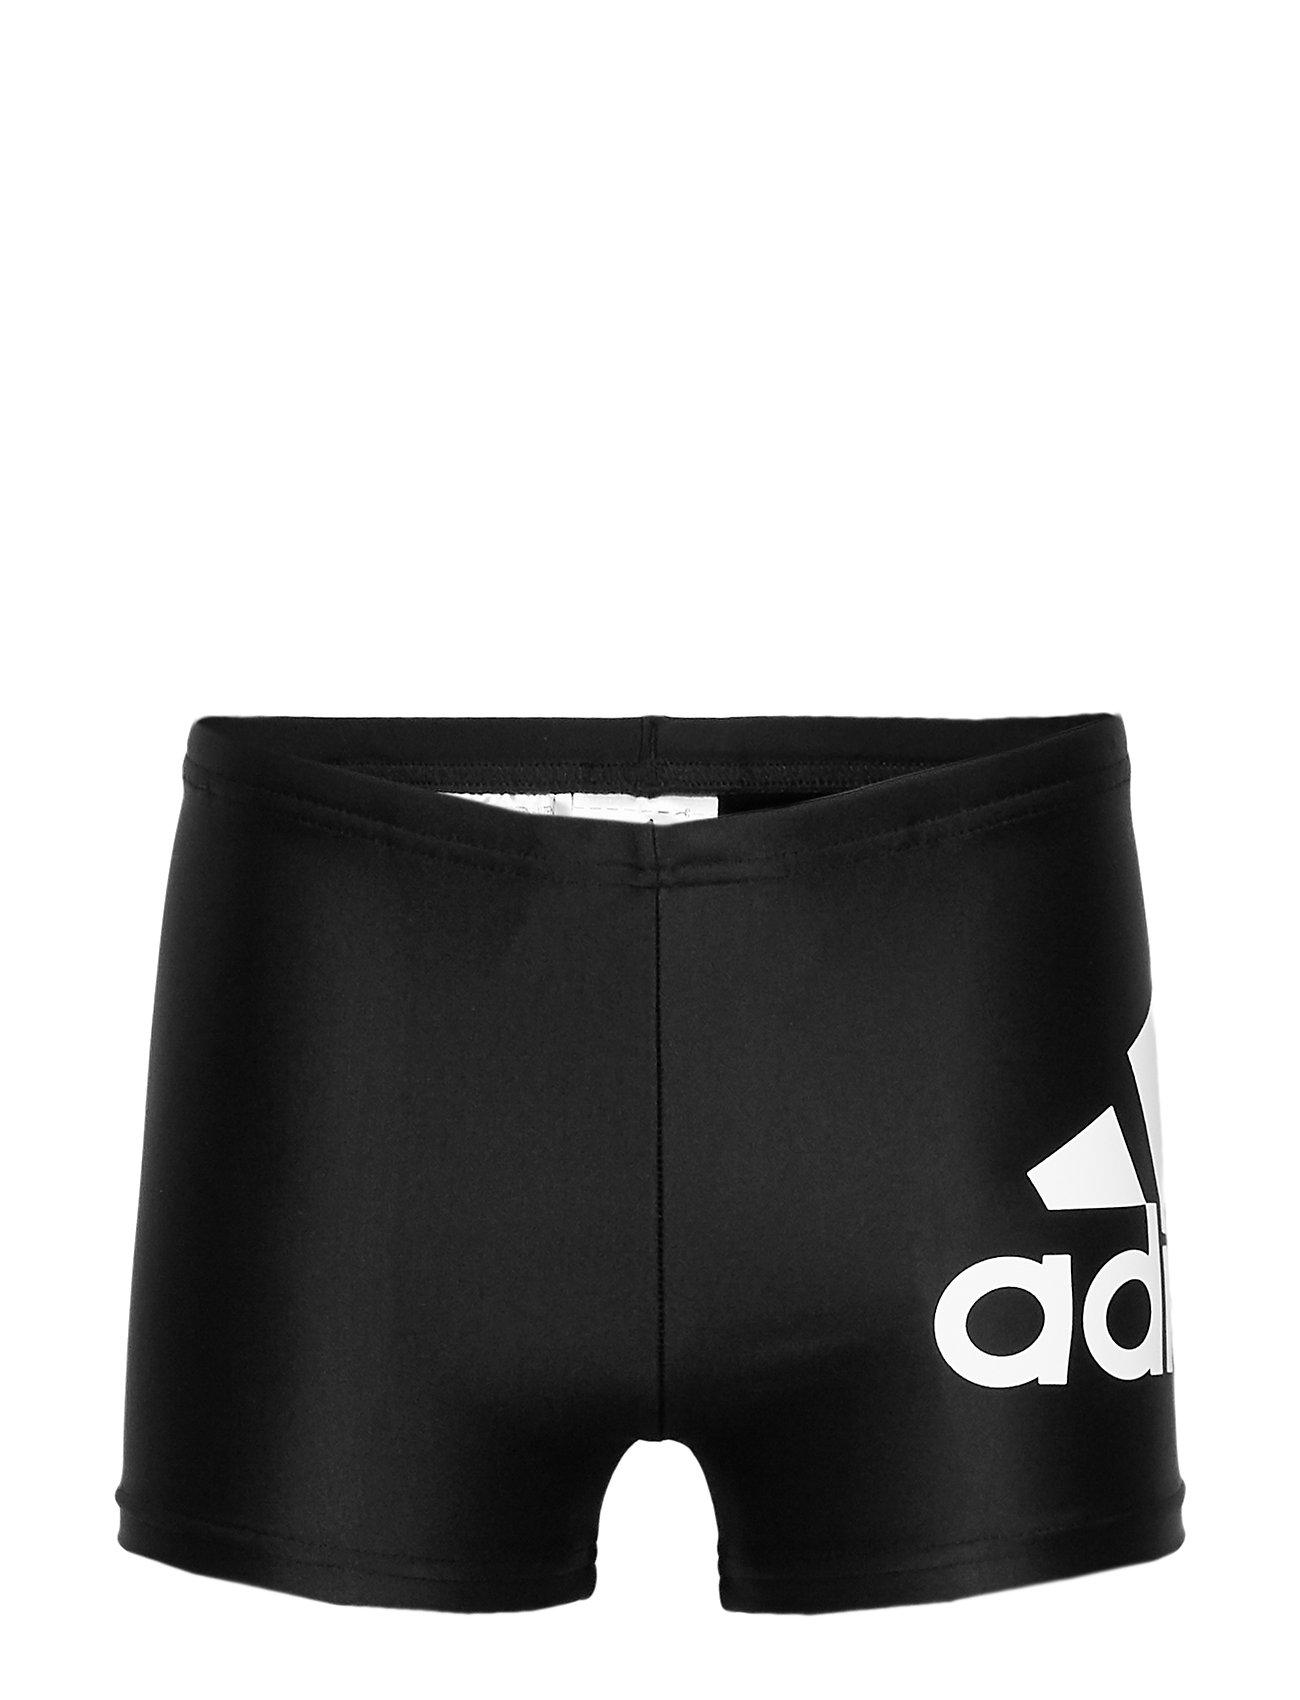 adidas Performance YA BOS BOXER - BLACK